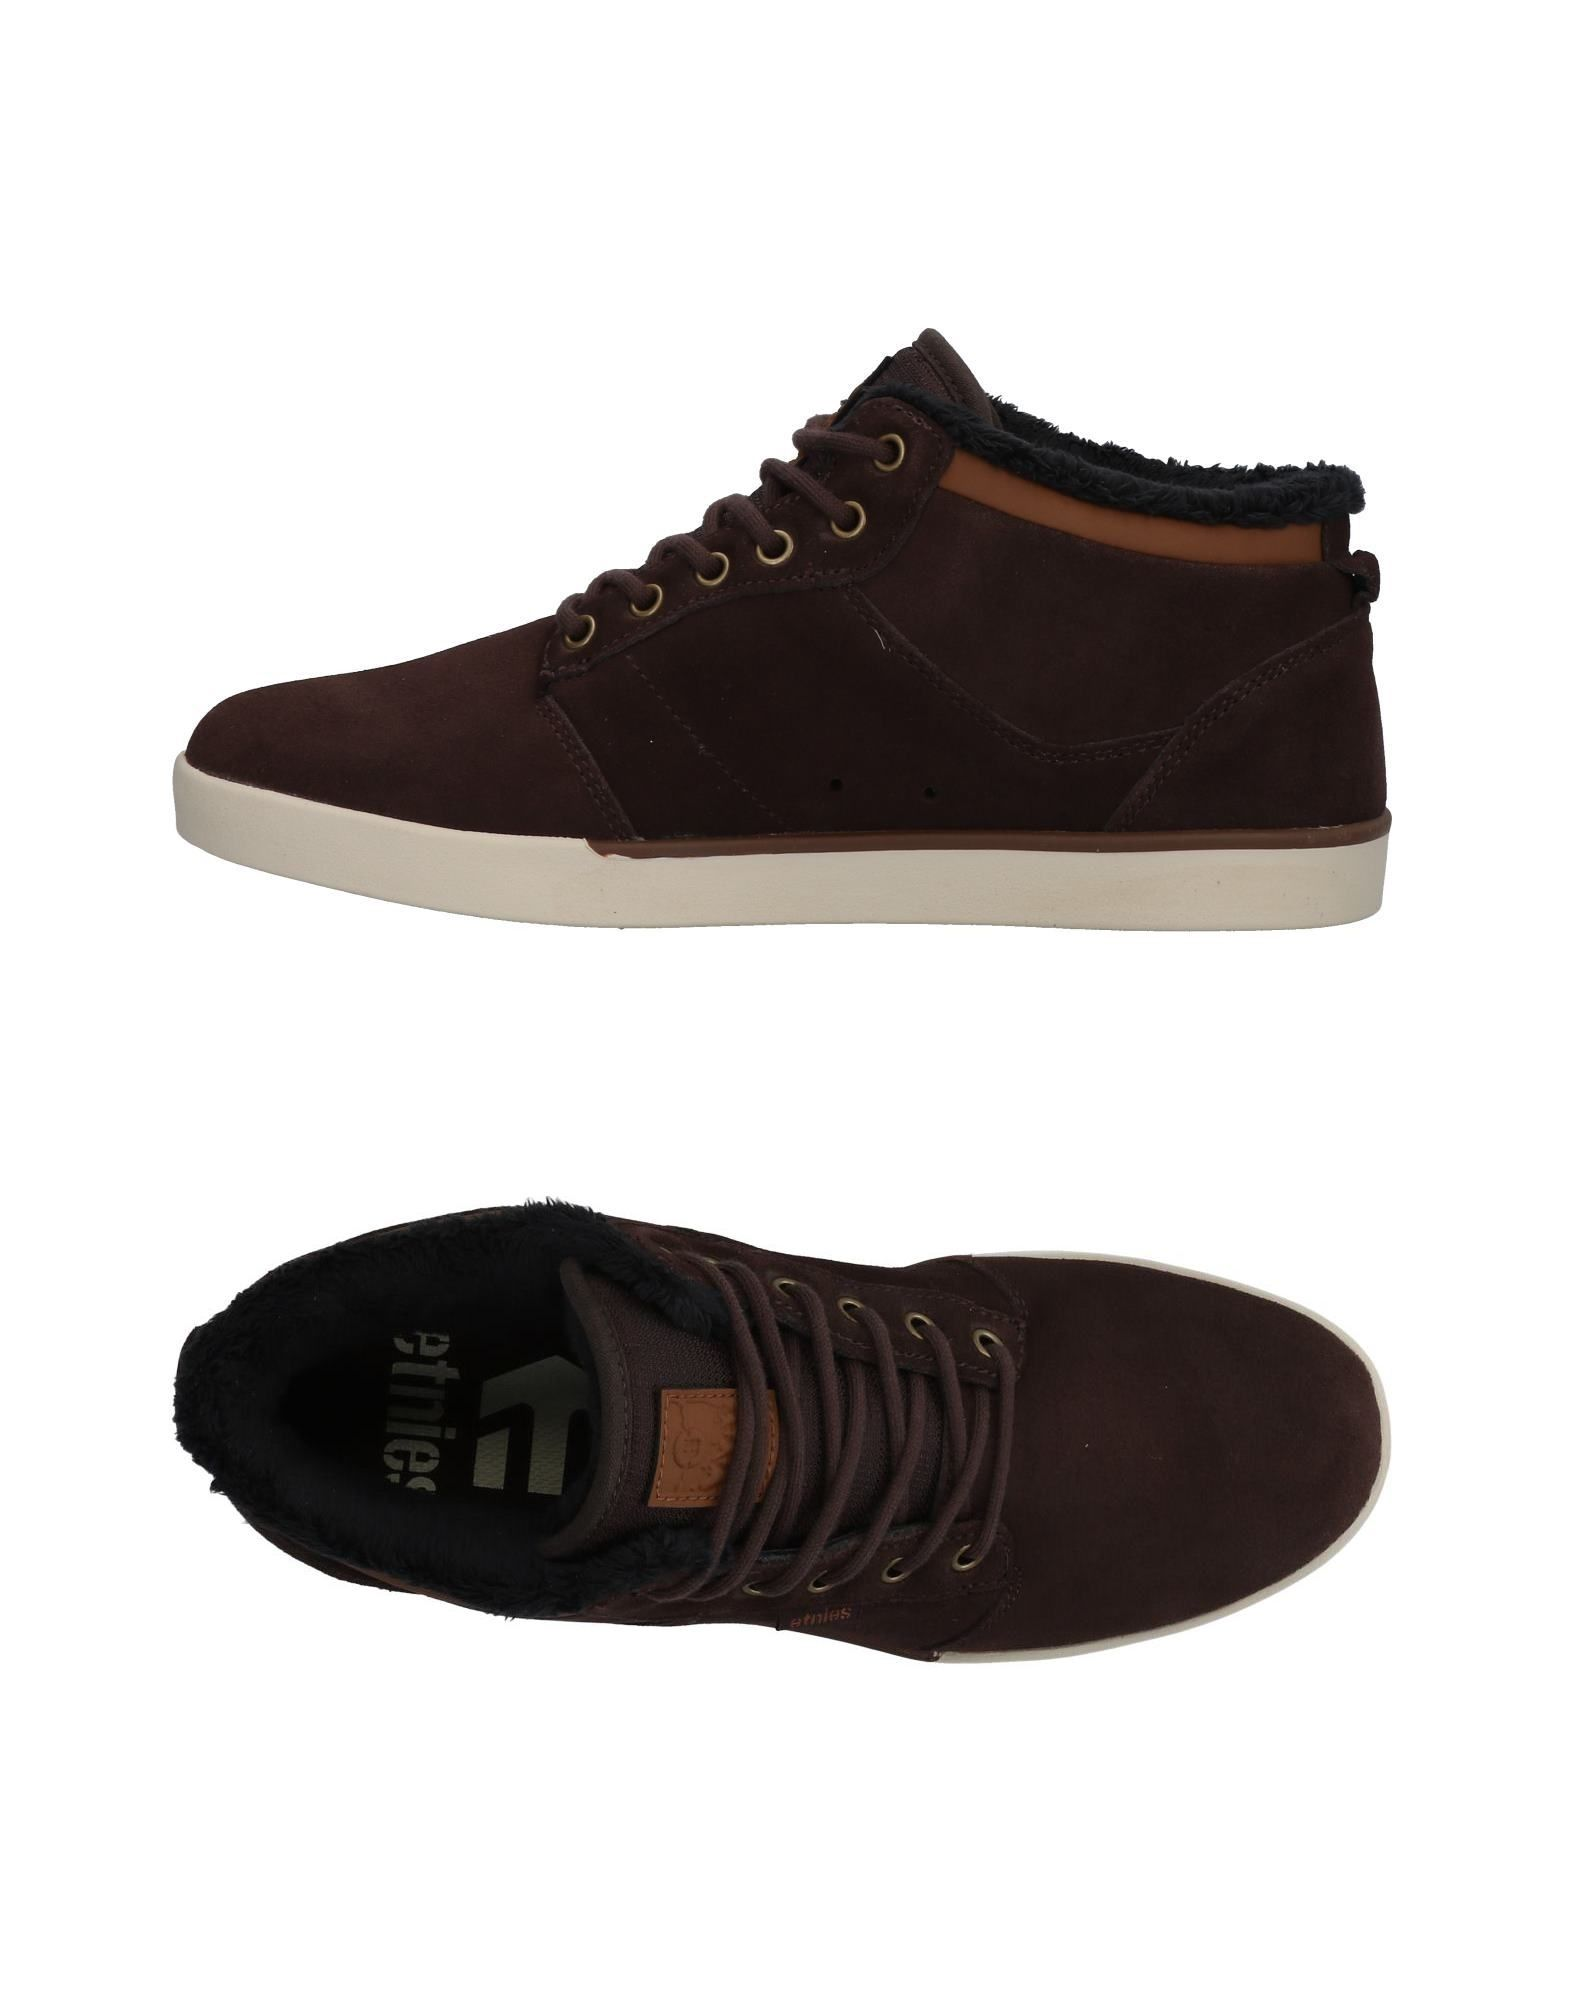 Sneakers Etnies Homme - Sneakers Etnies  Moka Mode pas cher et belle